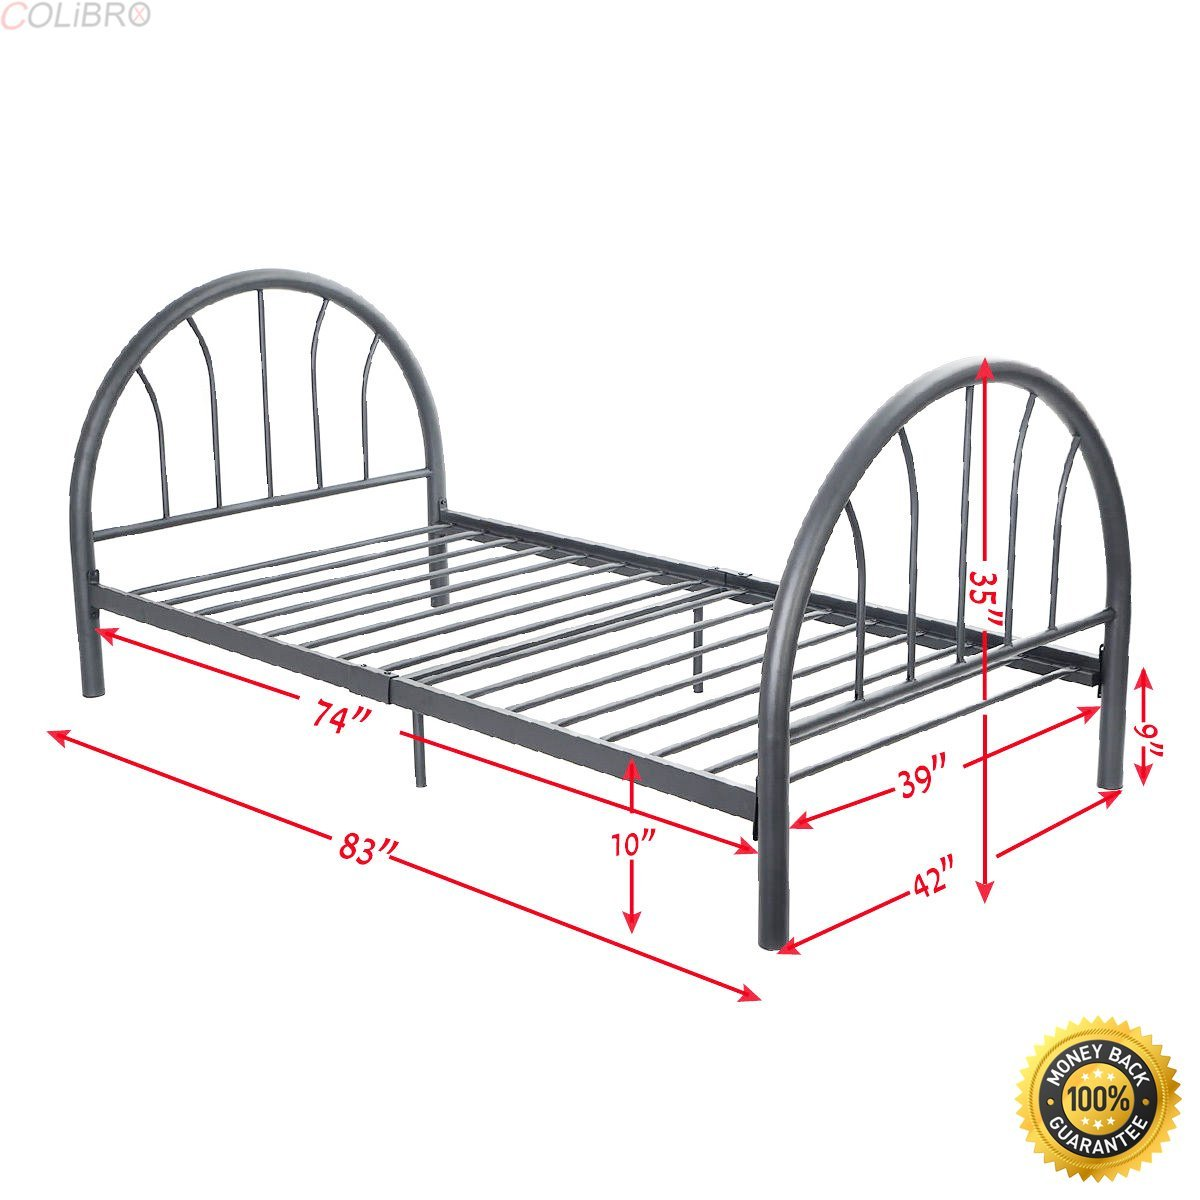 "COLIBROX--83""x42""x35"" Black Metal Bed Platform Frame Twin Size Bedroom Home Furniture New,metal bed frame queen,queen metal bed frame,Black Steel Bed Frame,bed frames full"